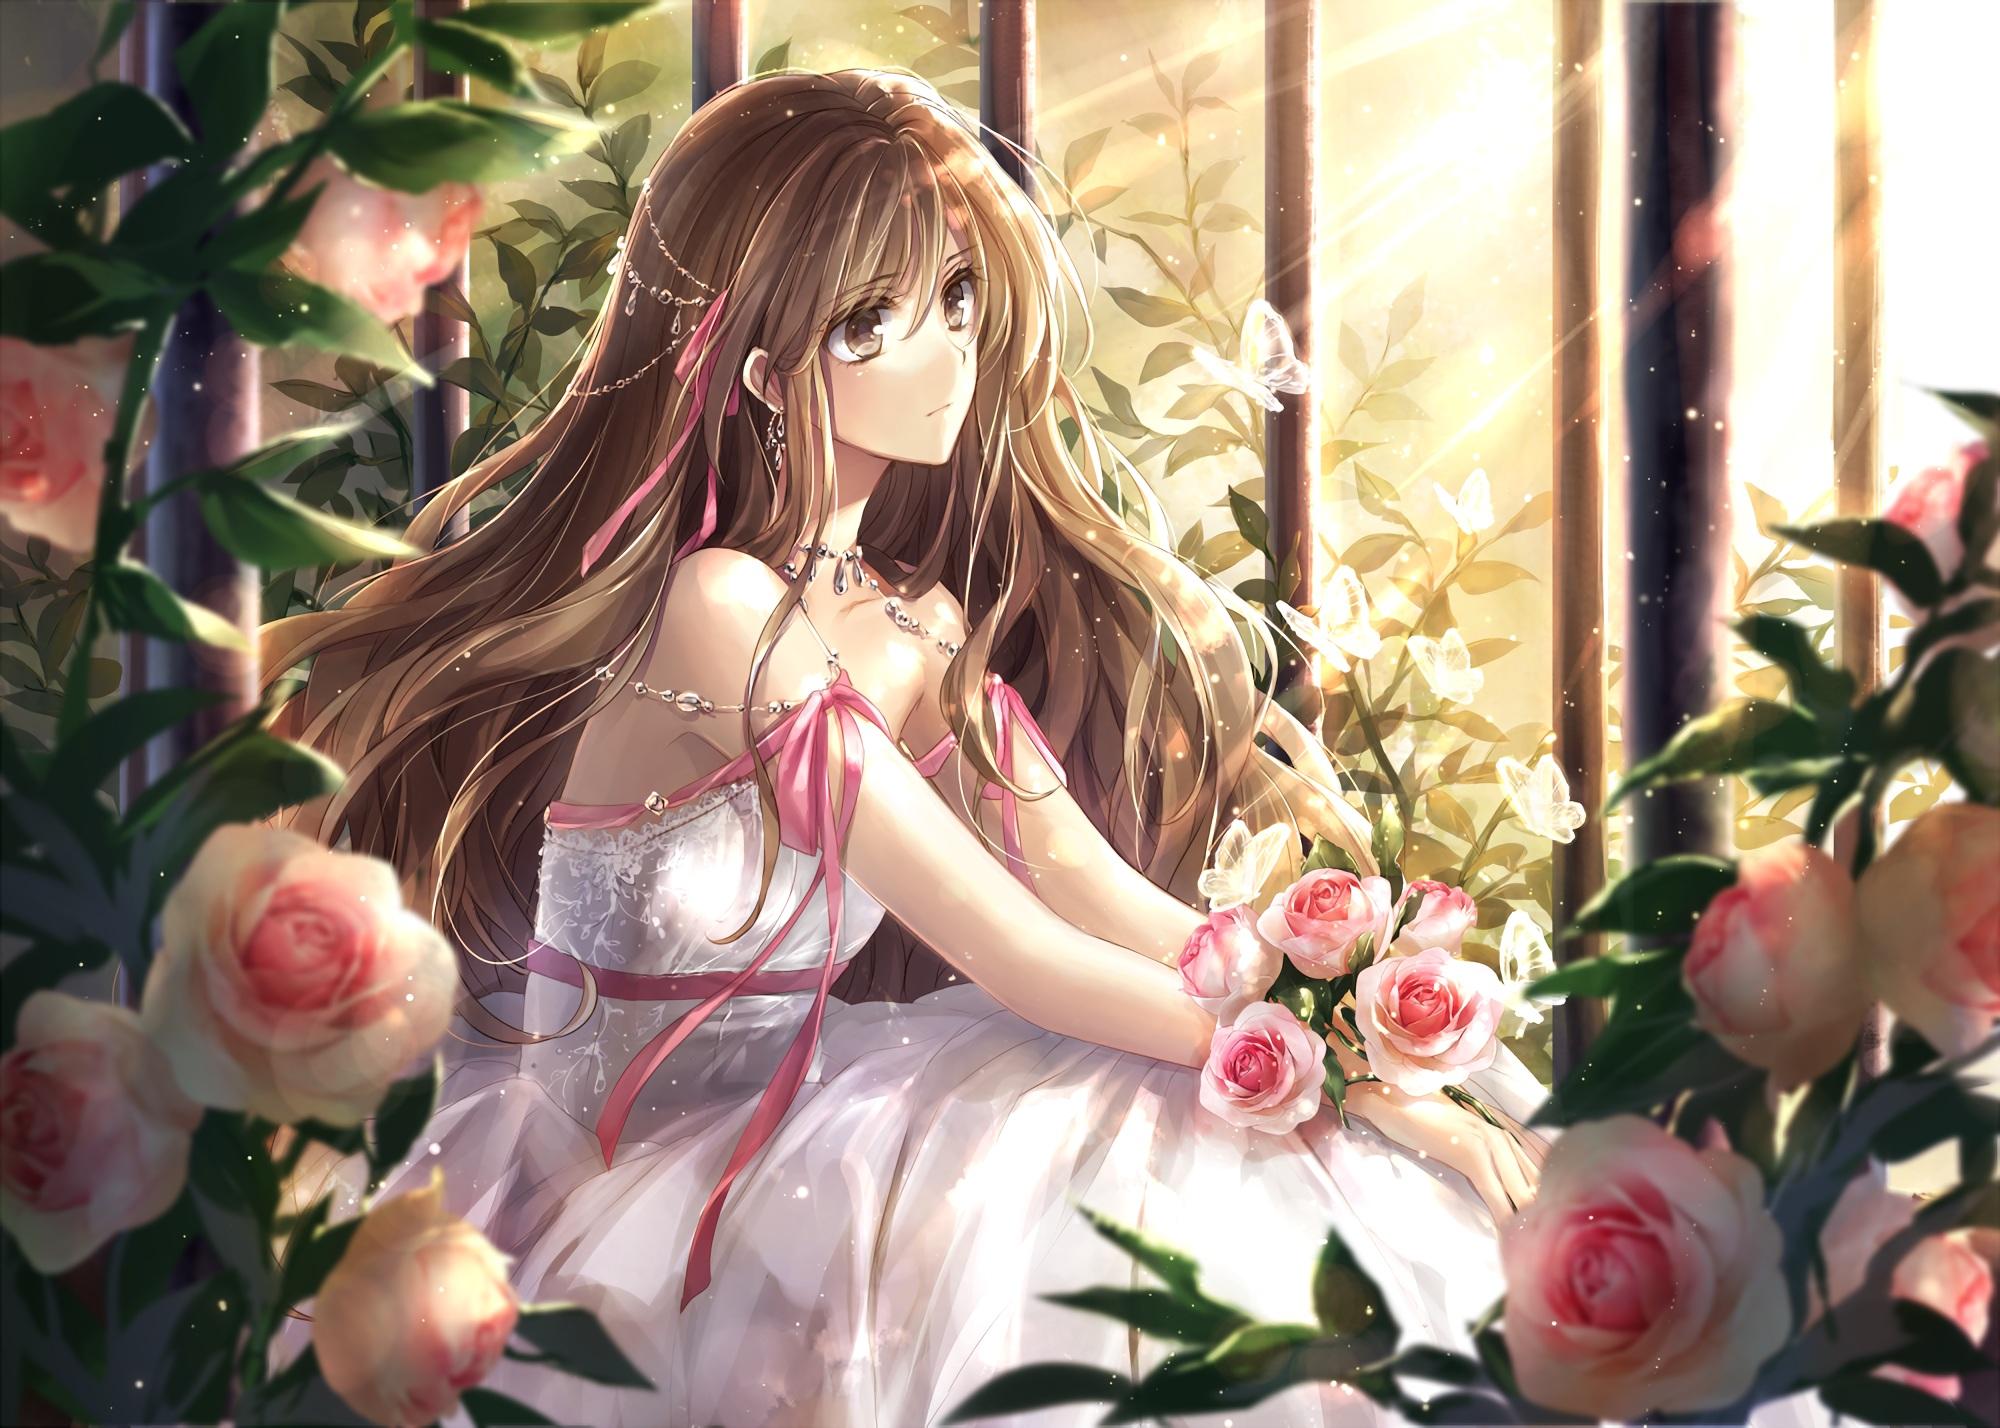 anime girl hd wallpaper | background image | 2000x1428 | id:681351